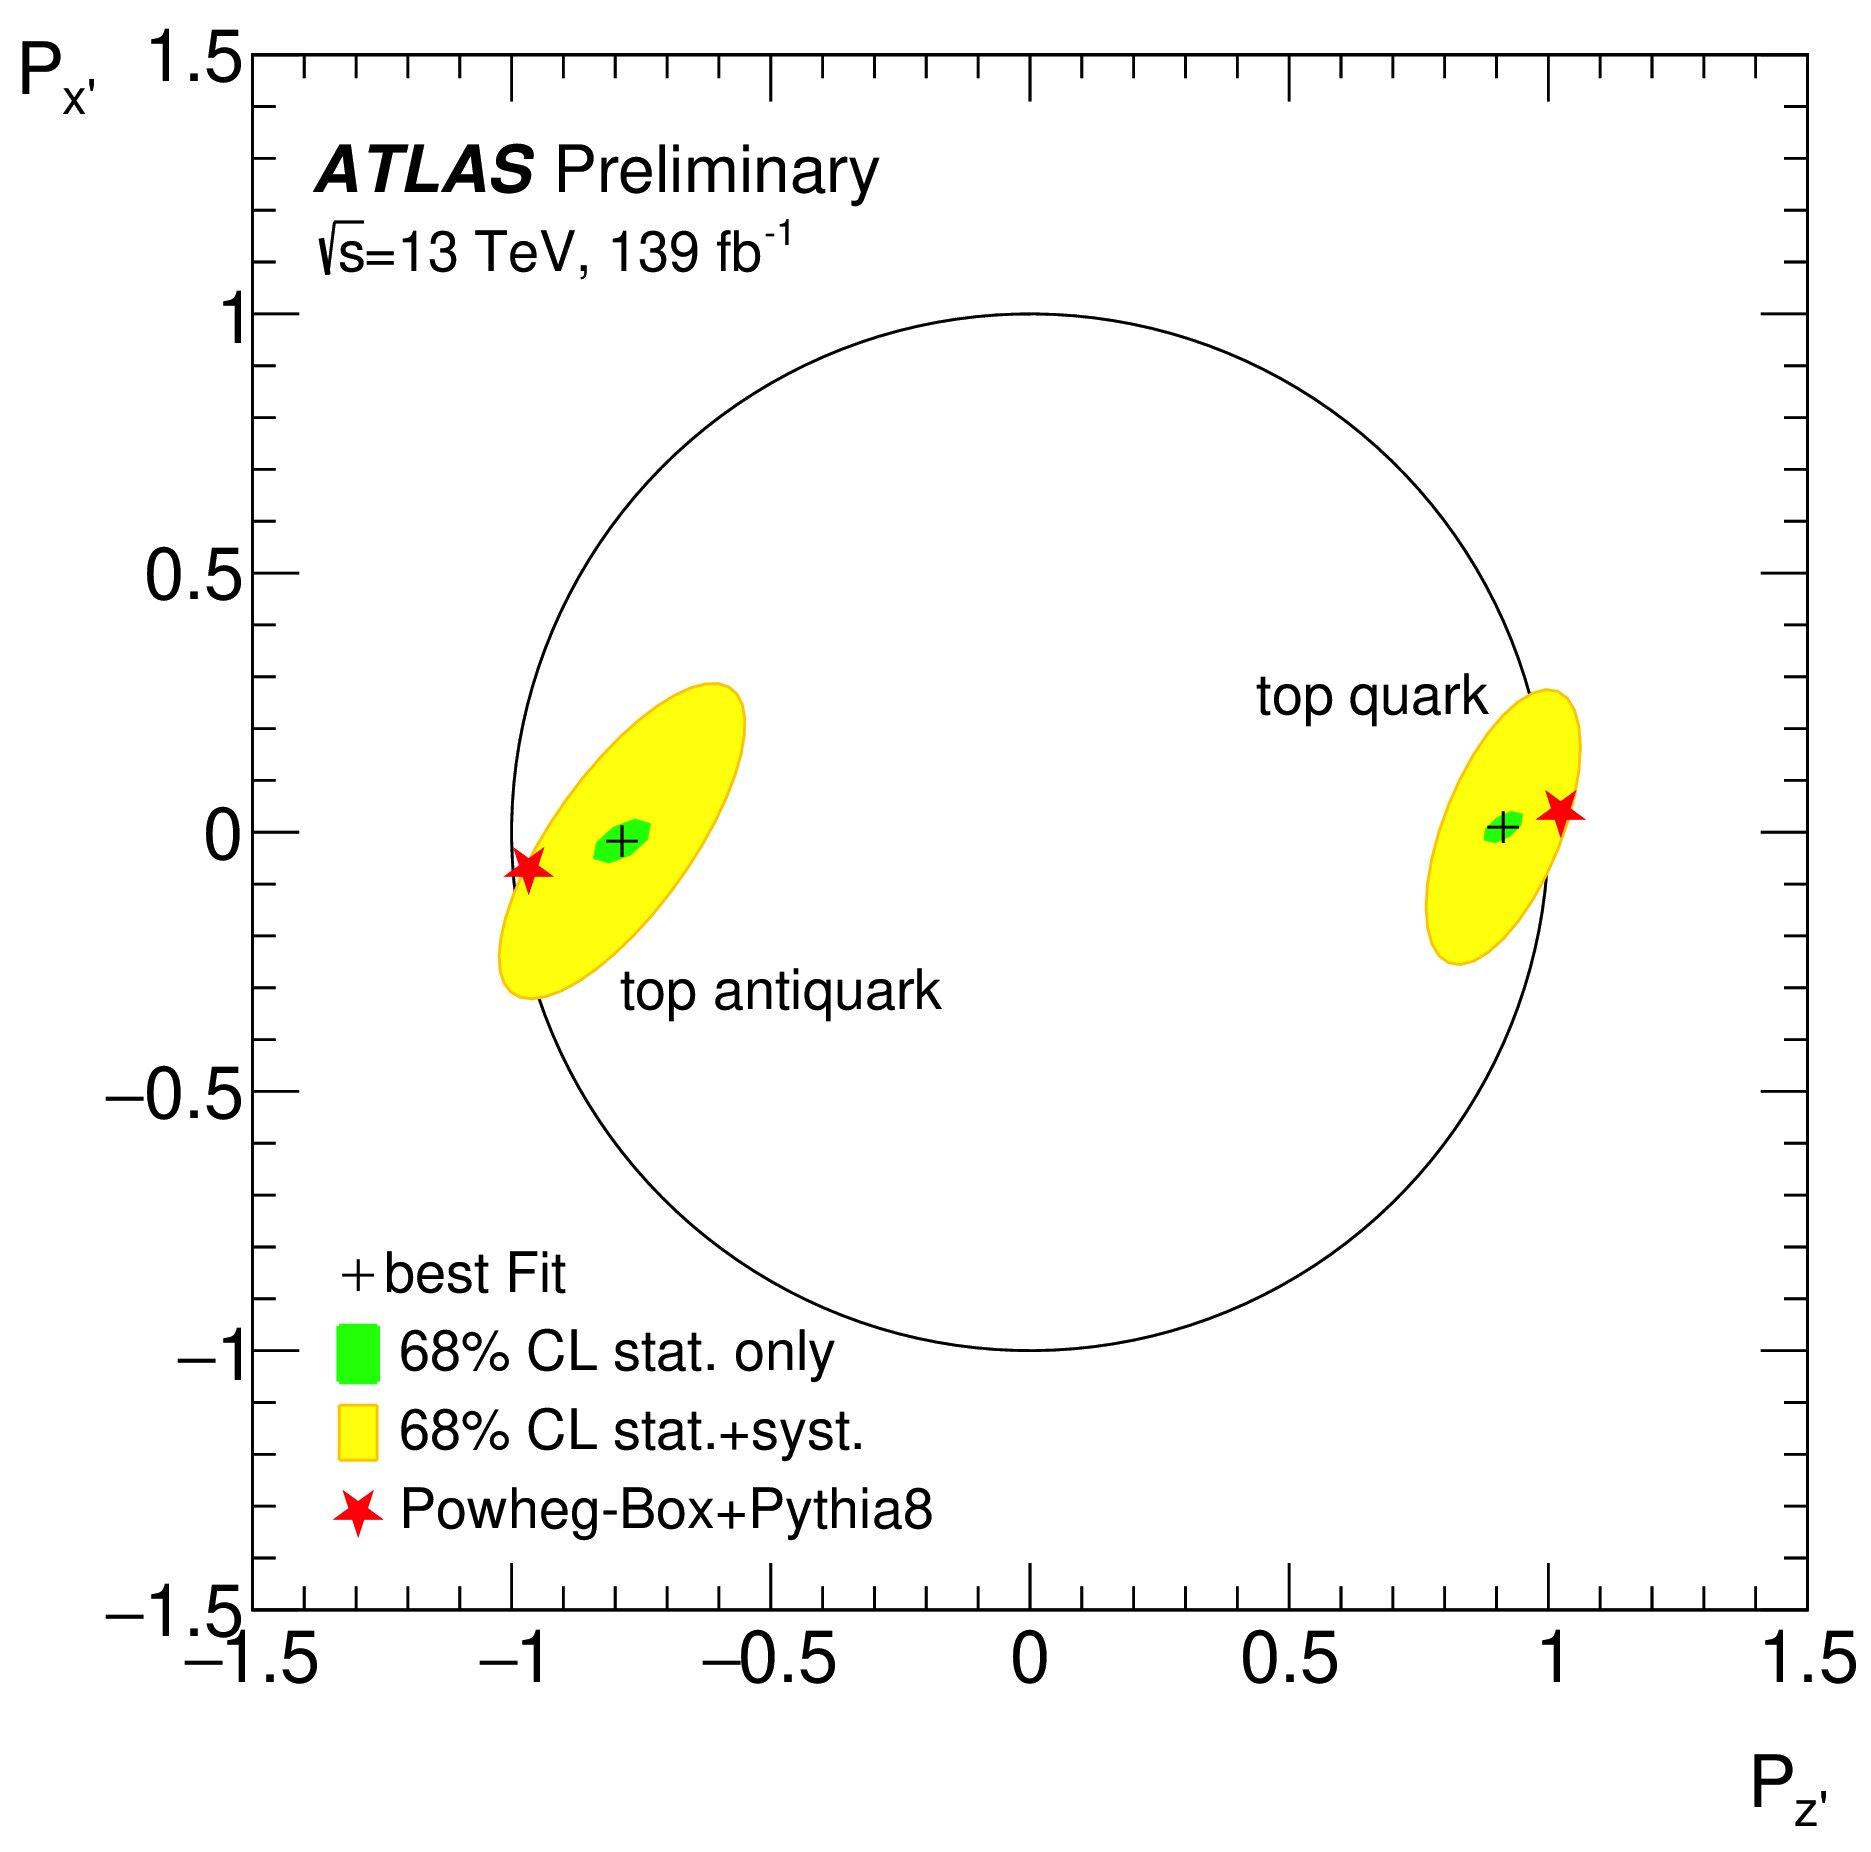 ATLAS experiment measures top quark polarization